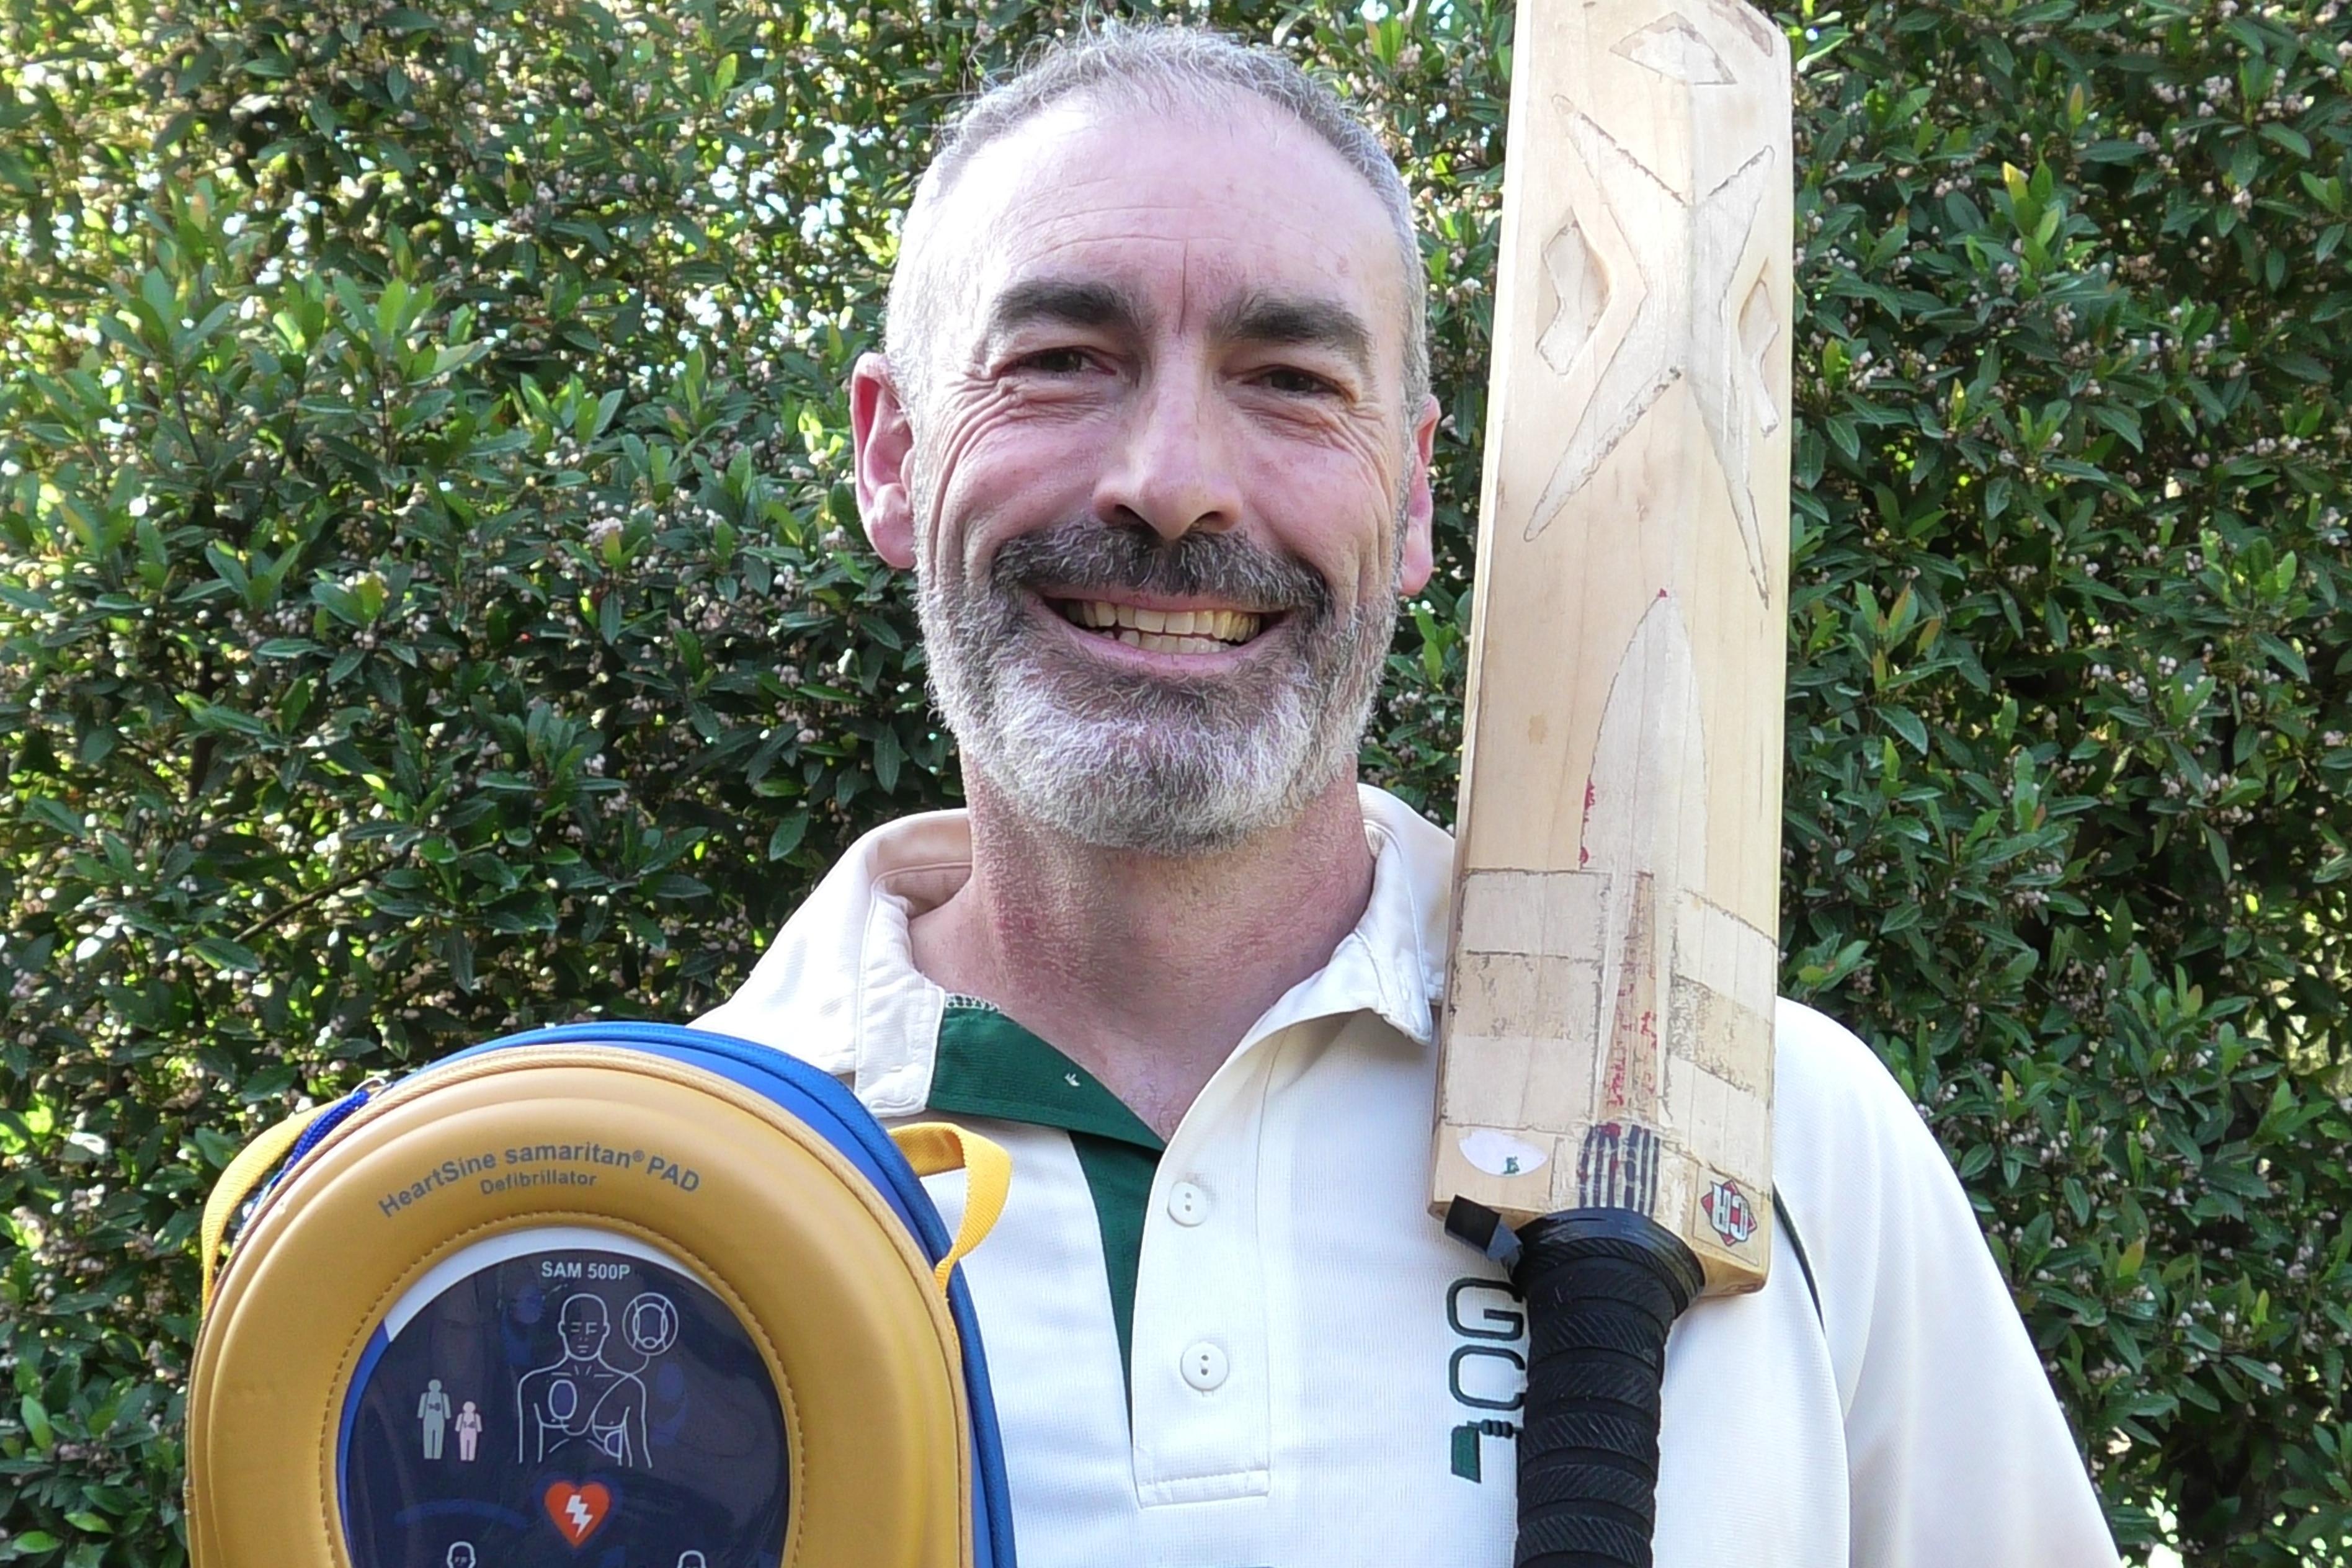 Cricket Australia: Community Heart Program launched for cricket